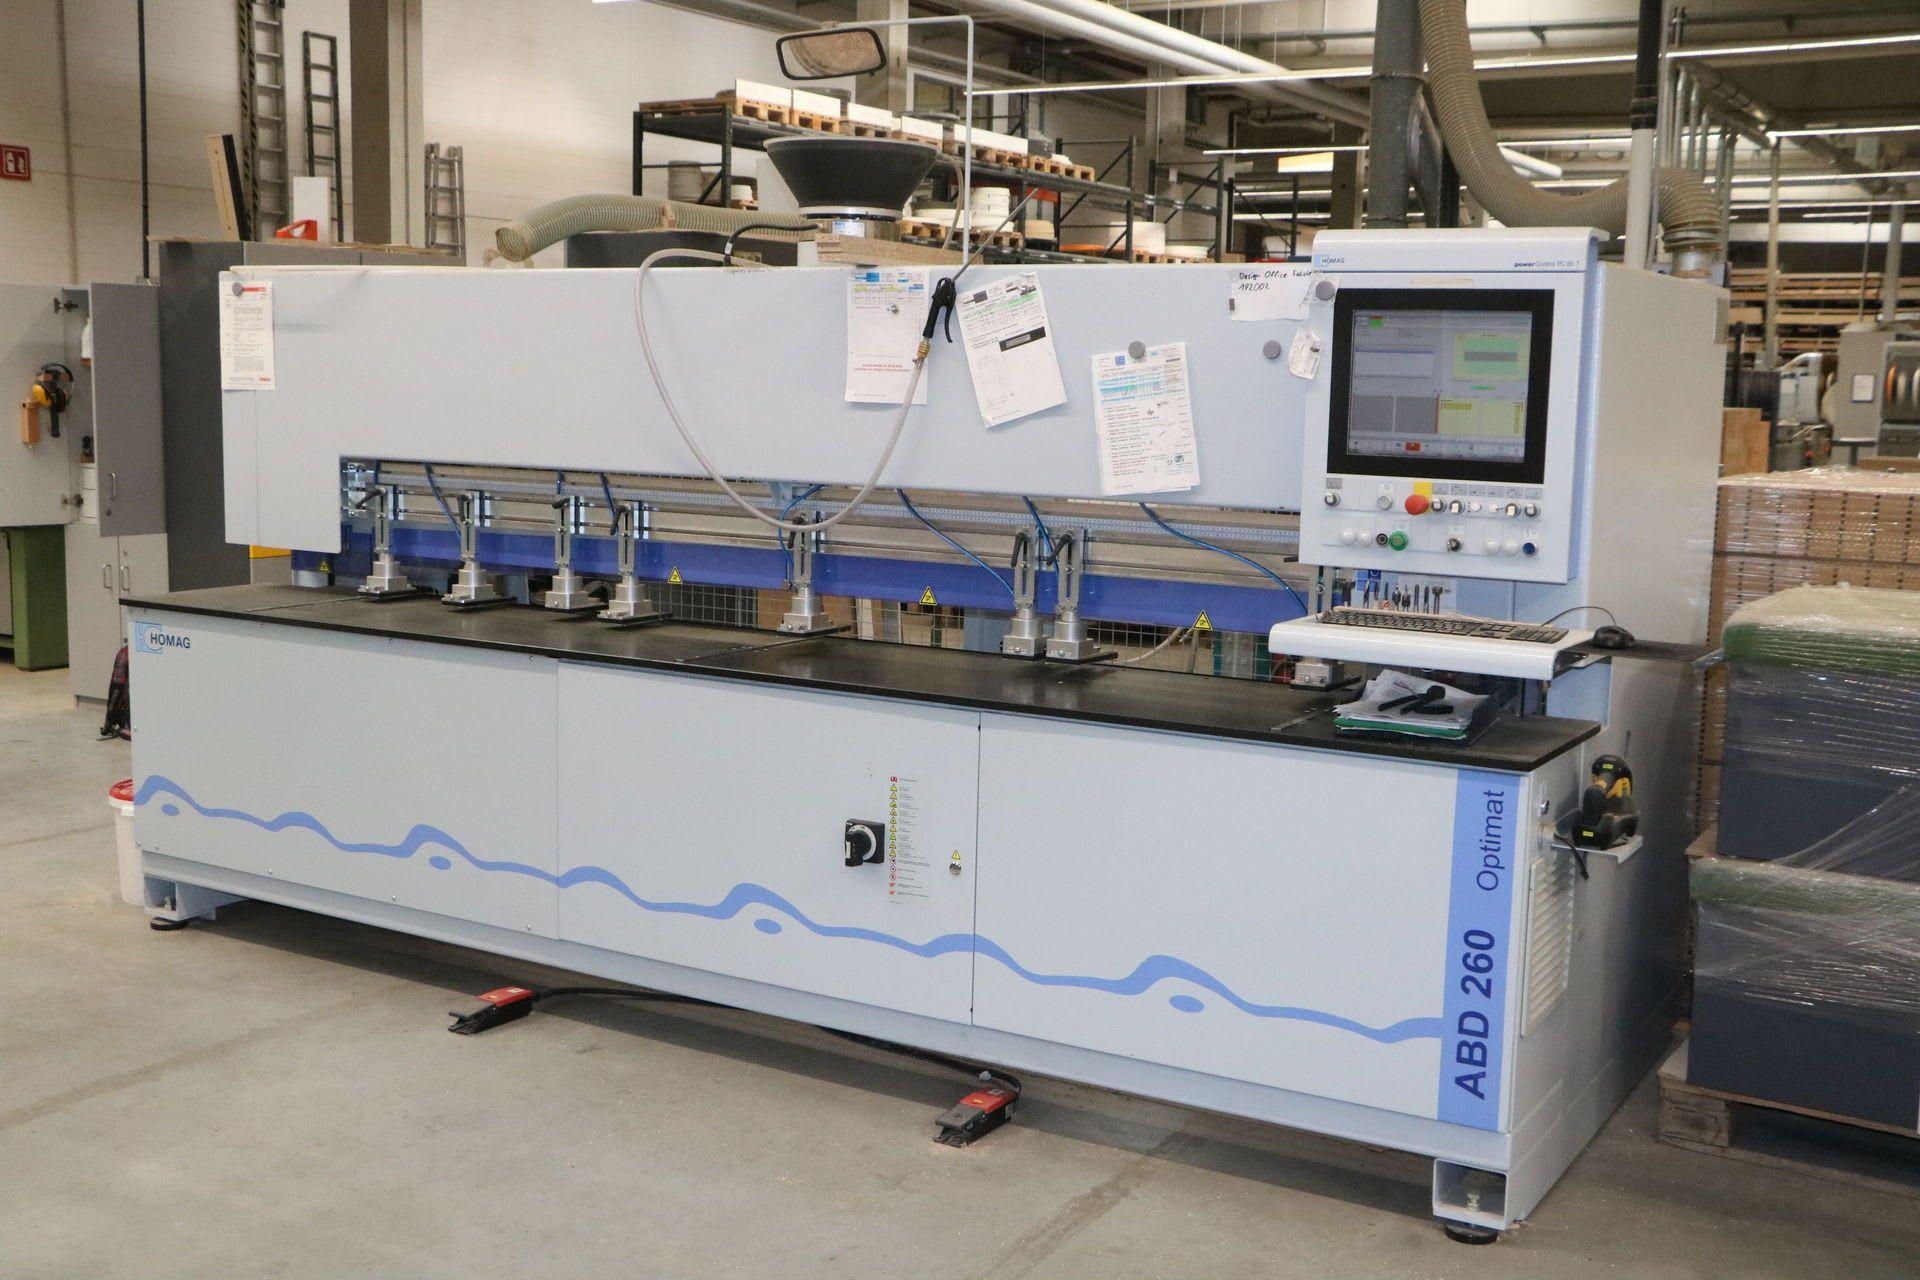 HOMAG OPTIMAT ABD260 / D28 CNC Bohr- und Dübeleintreibautomat